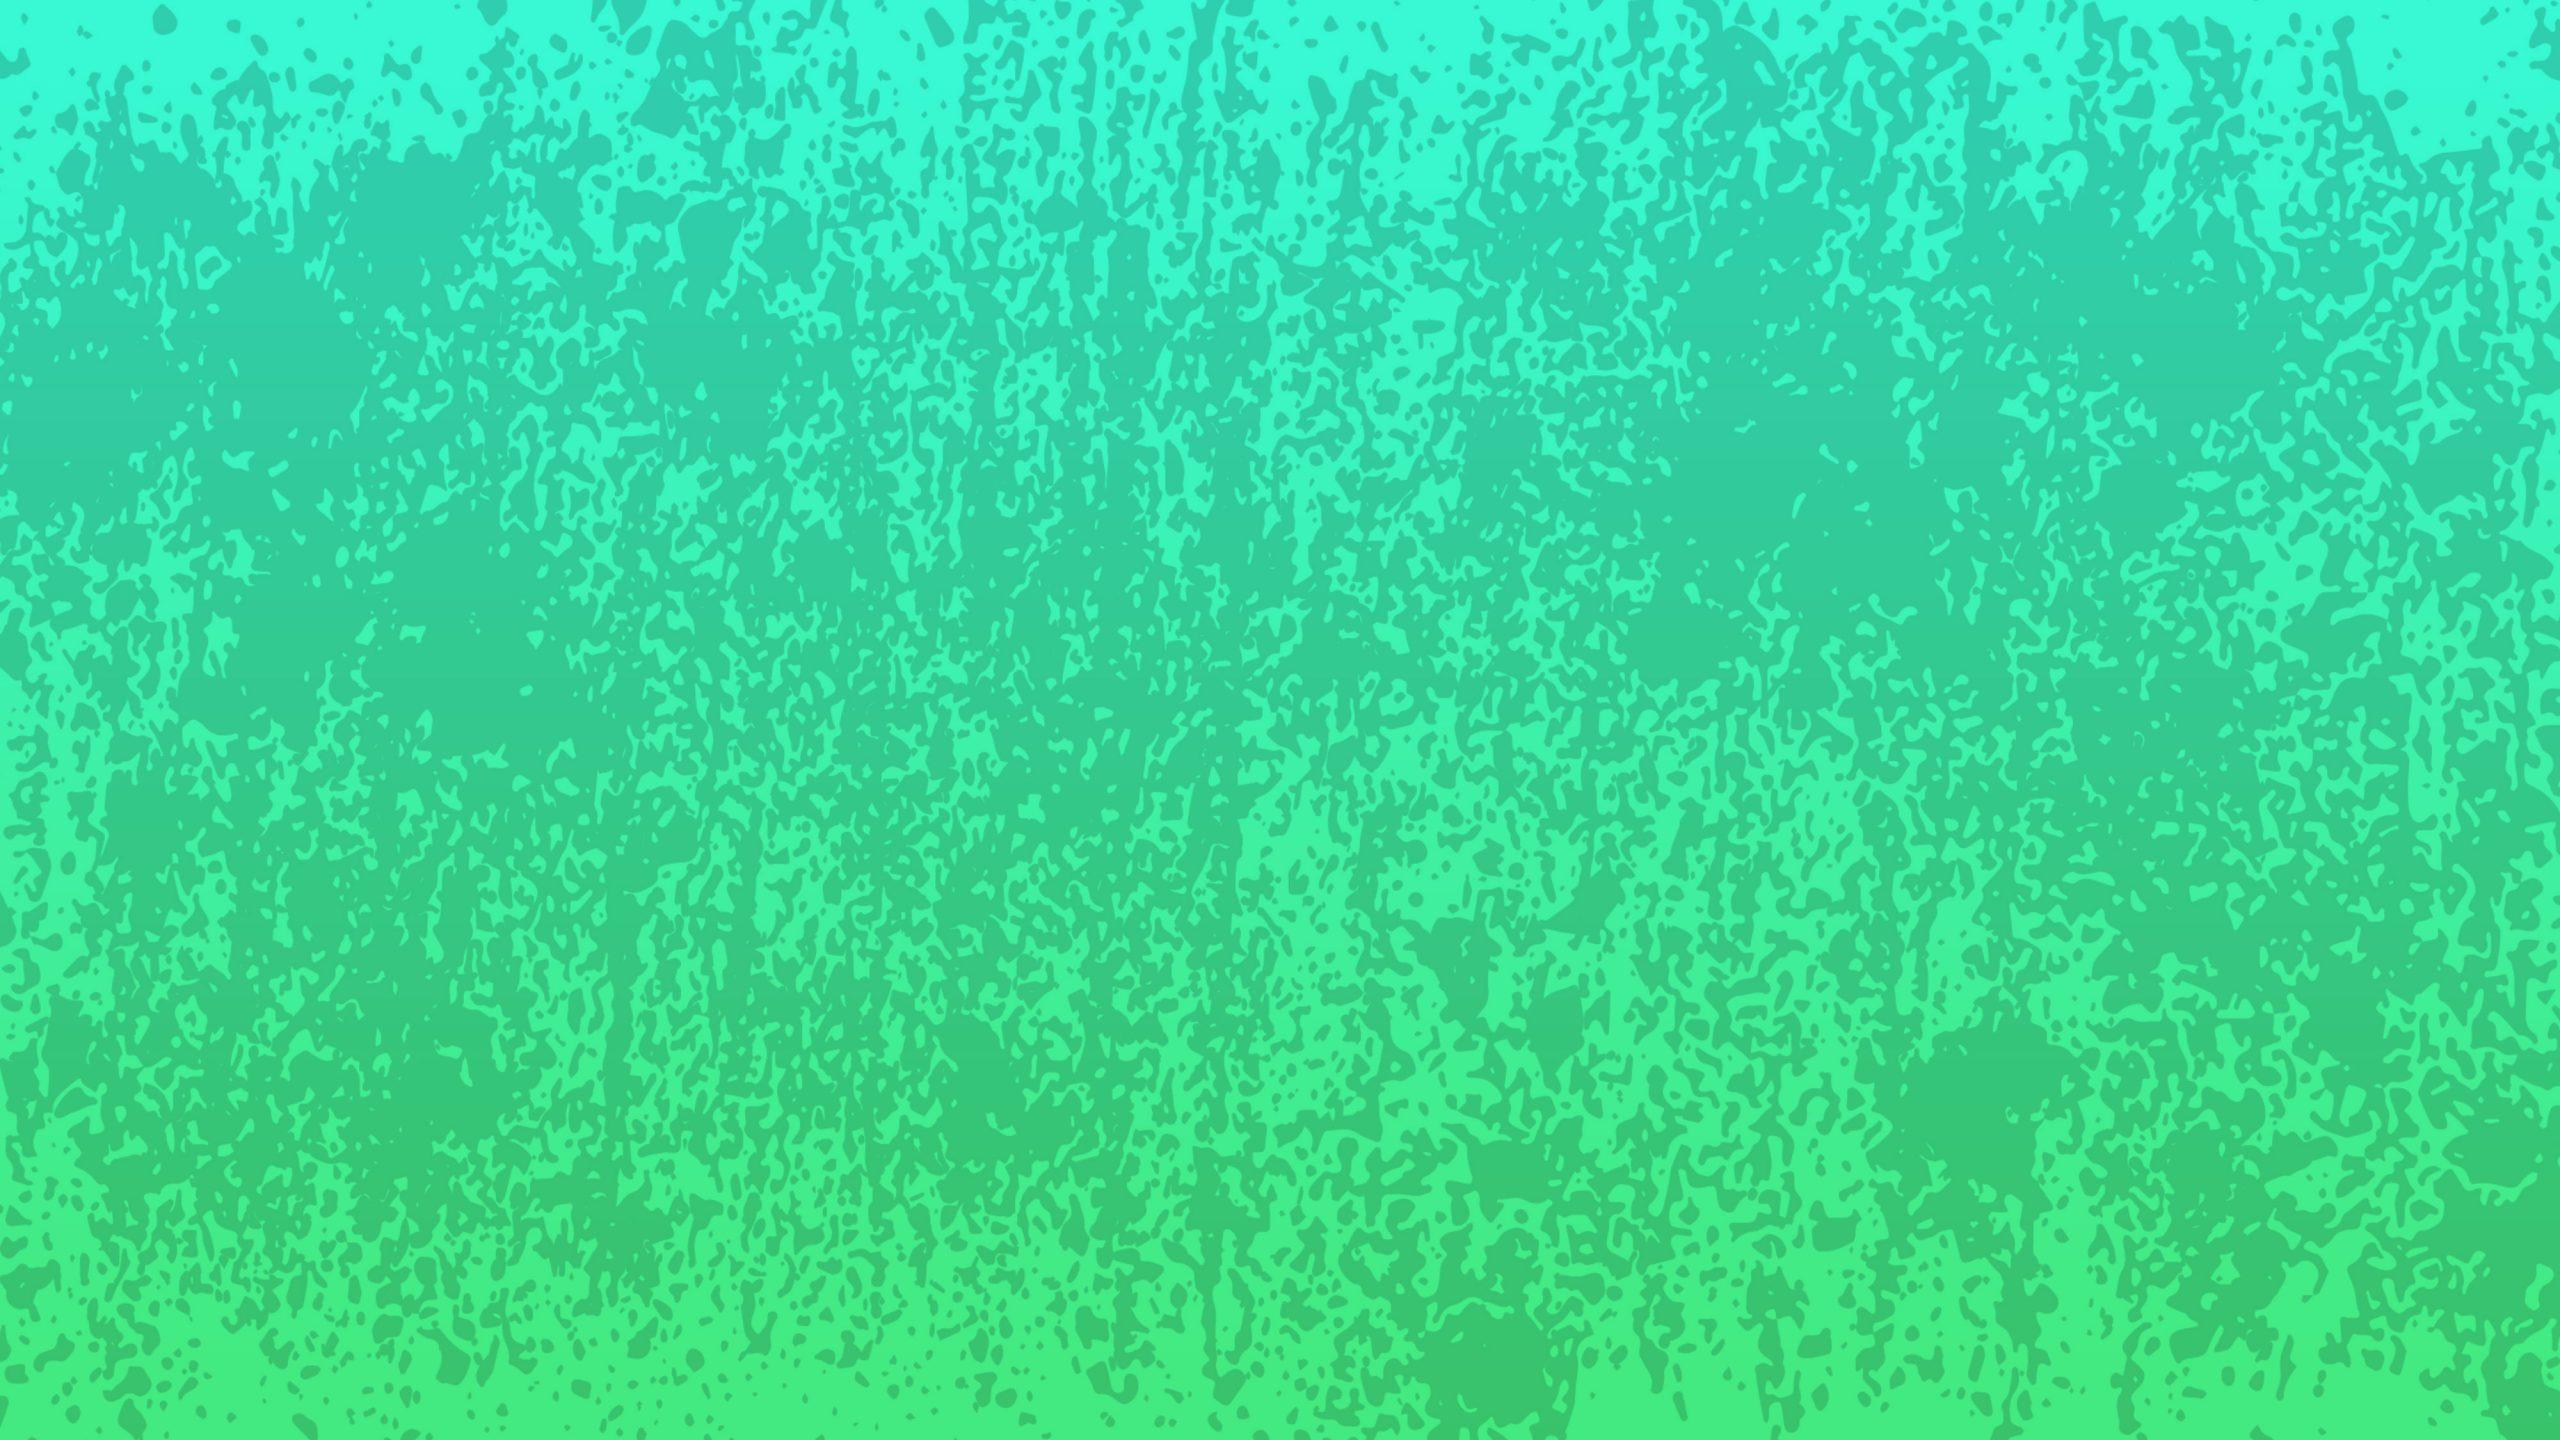 green-pattern-background